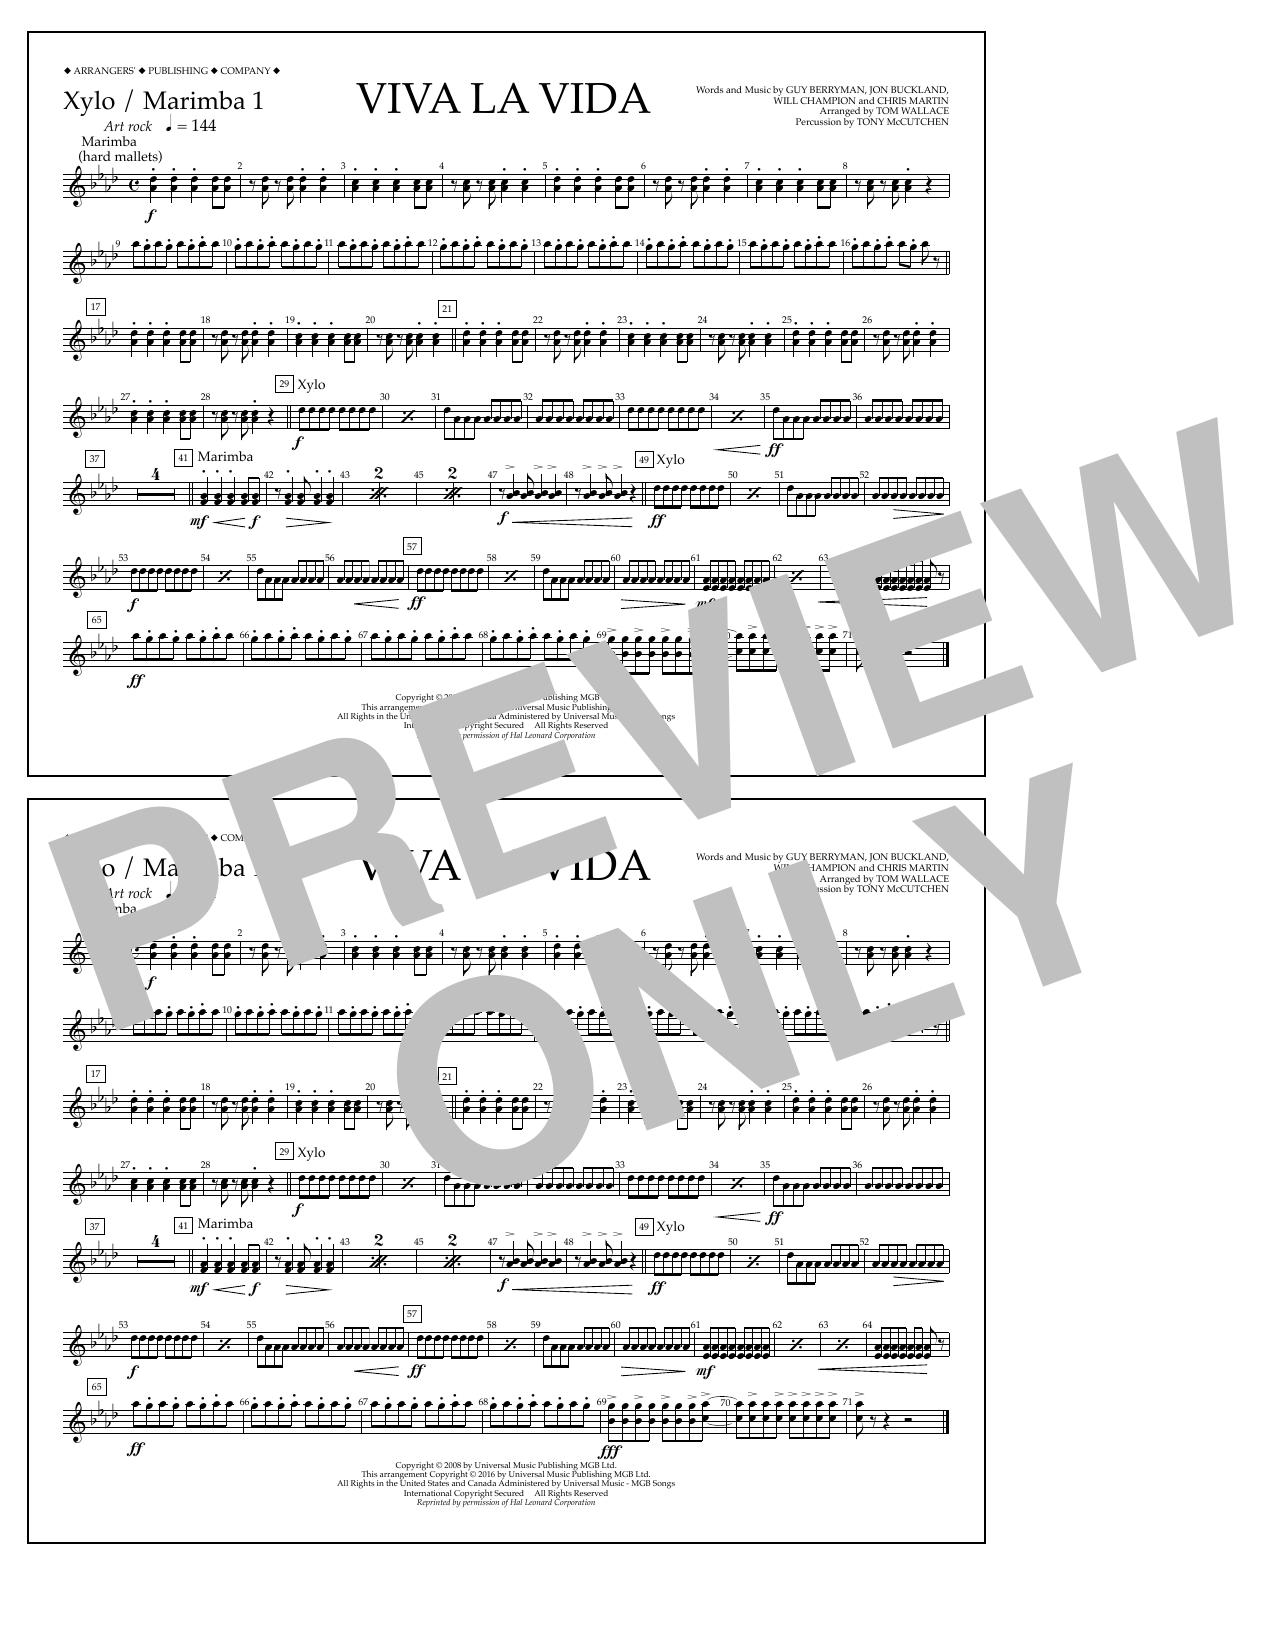 Coldplay - Viva La Vida - Xylo./Marimba 1